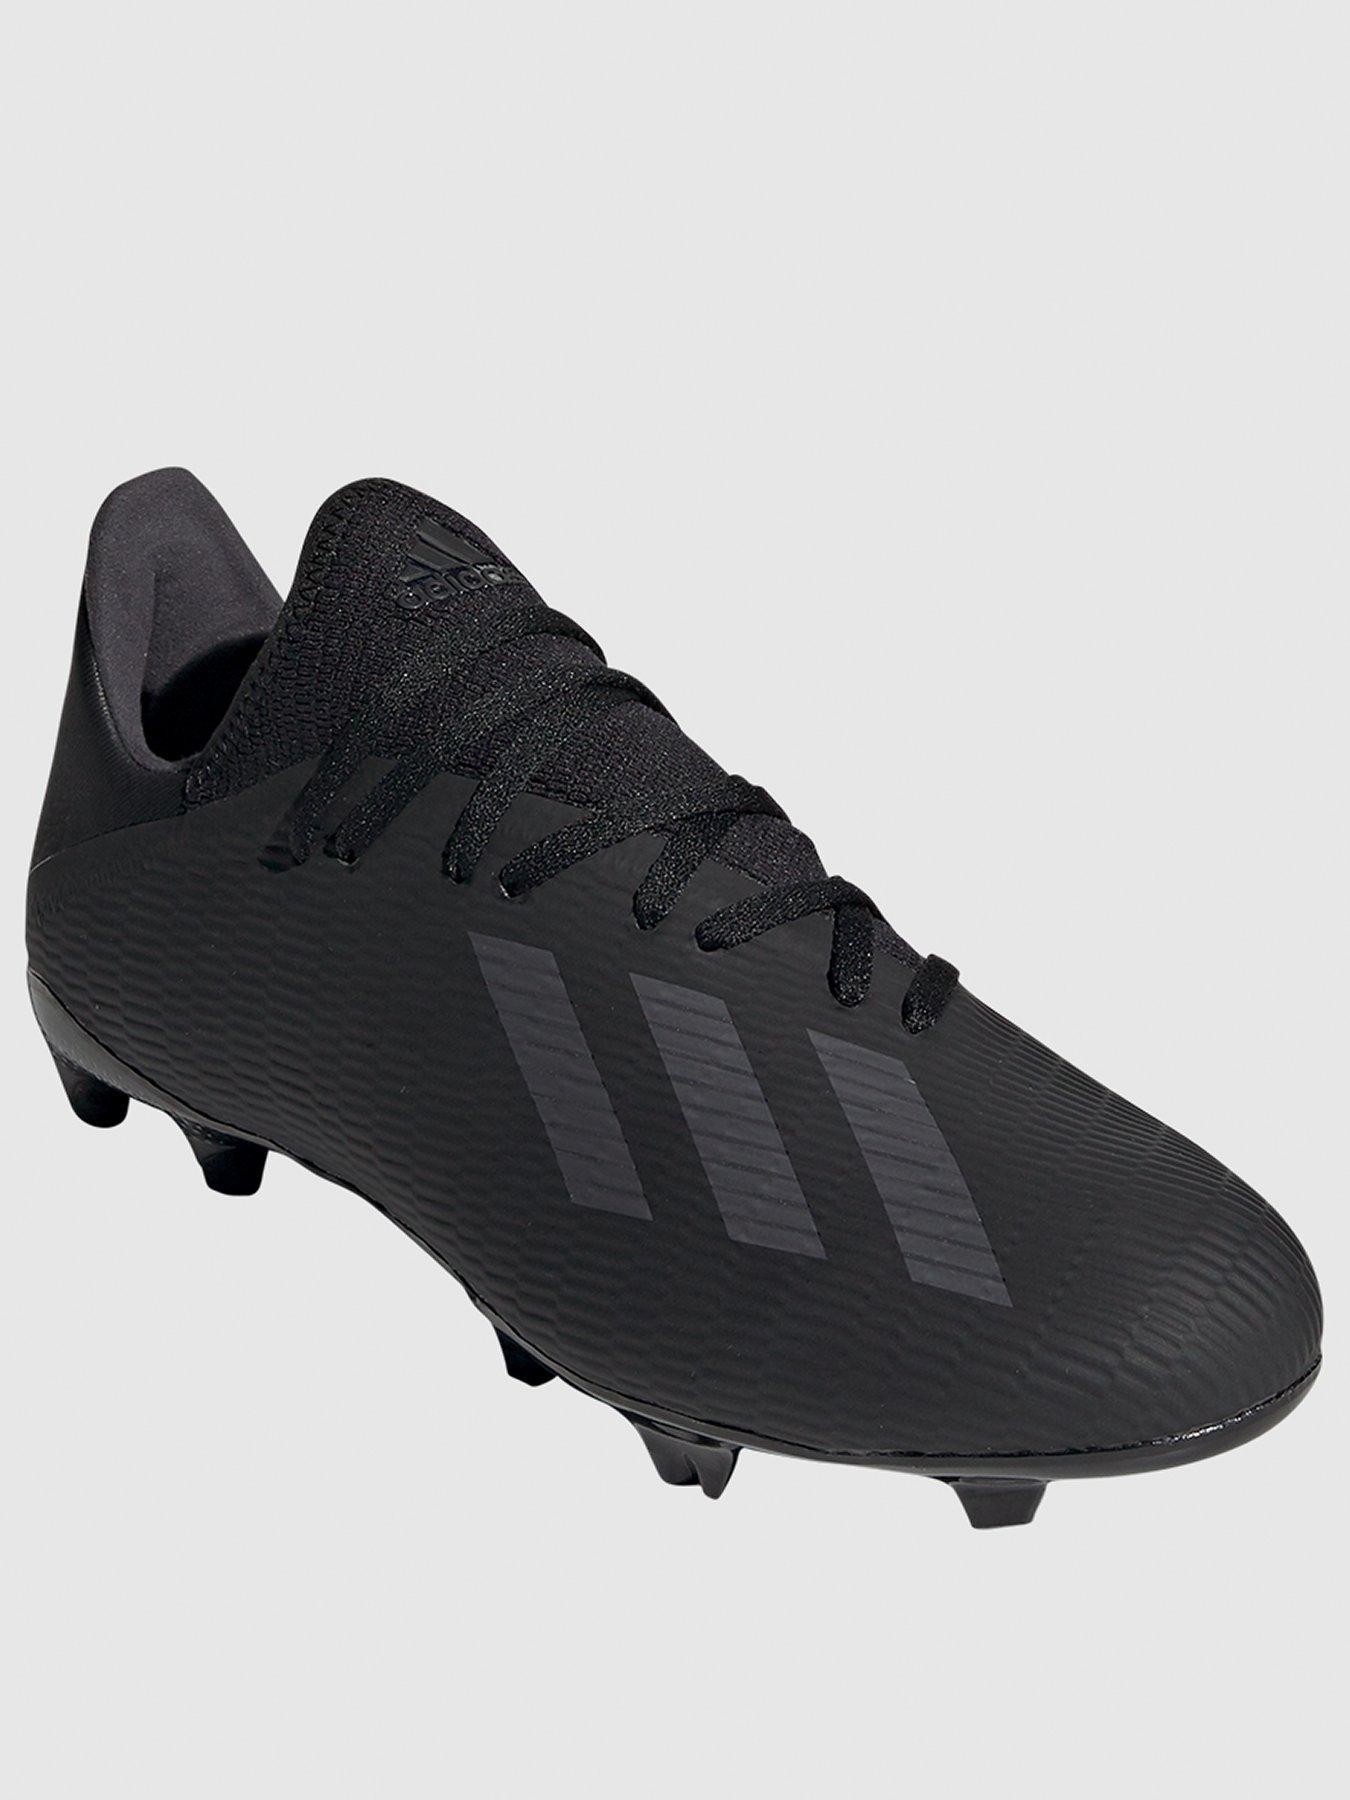 adidas Predator 20.3 Laceless FG Core BlackSolid Grey